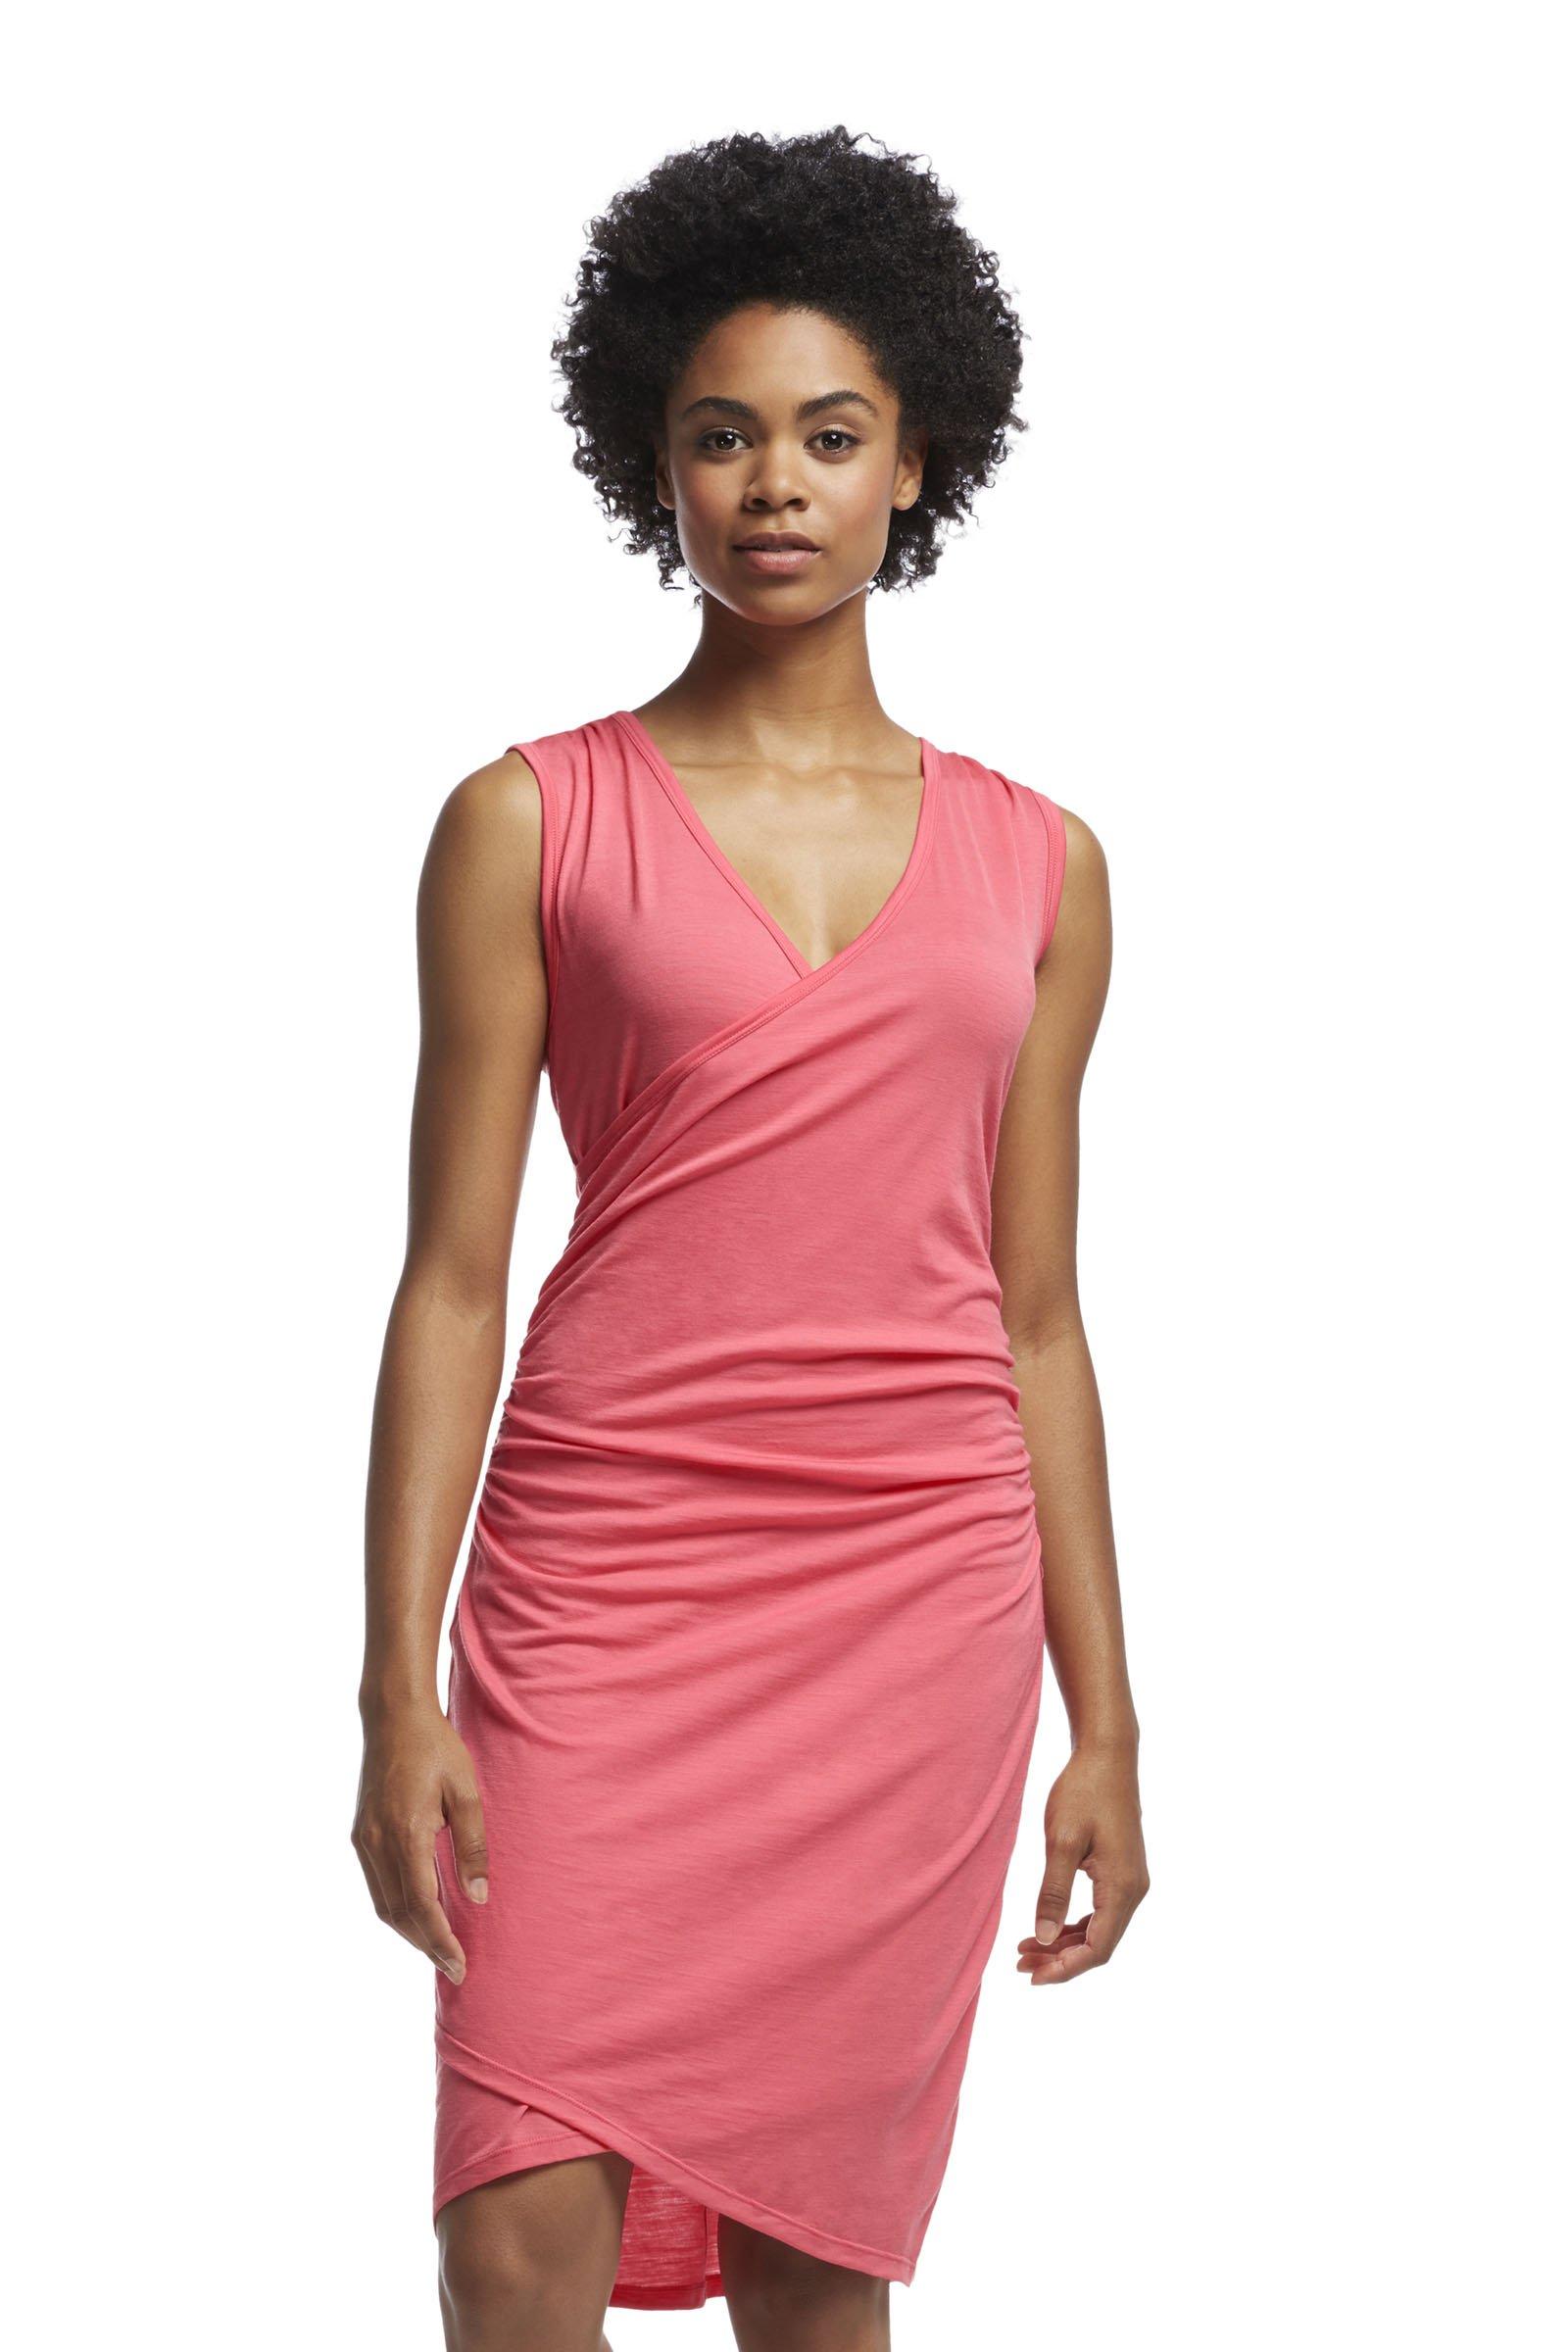 Icebreaker Women's Aria Tank Dress, Medium, Grapefruit